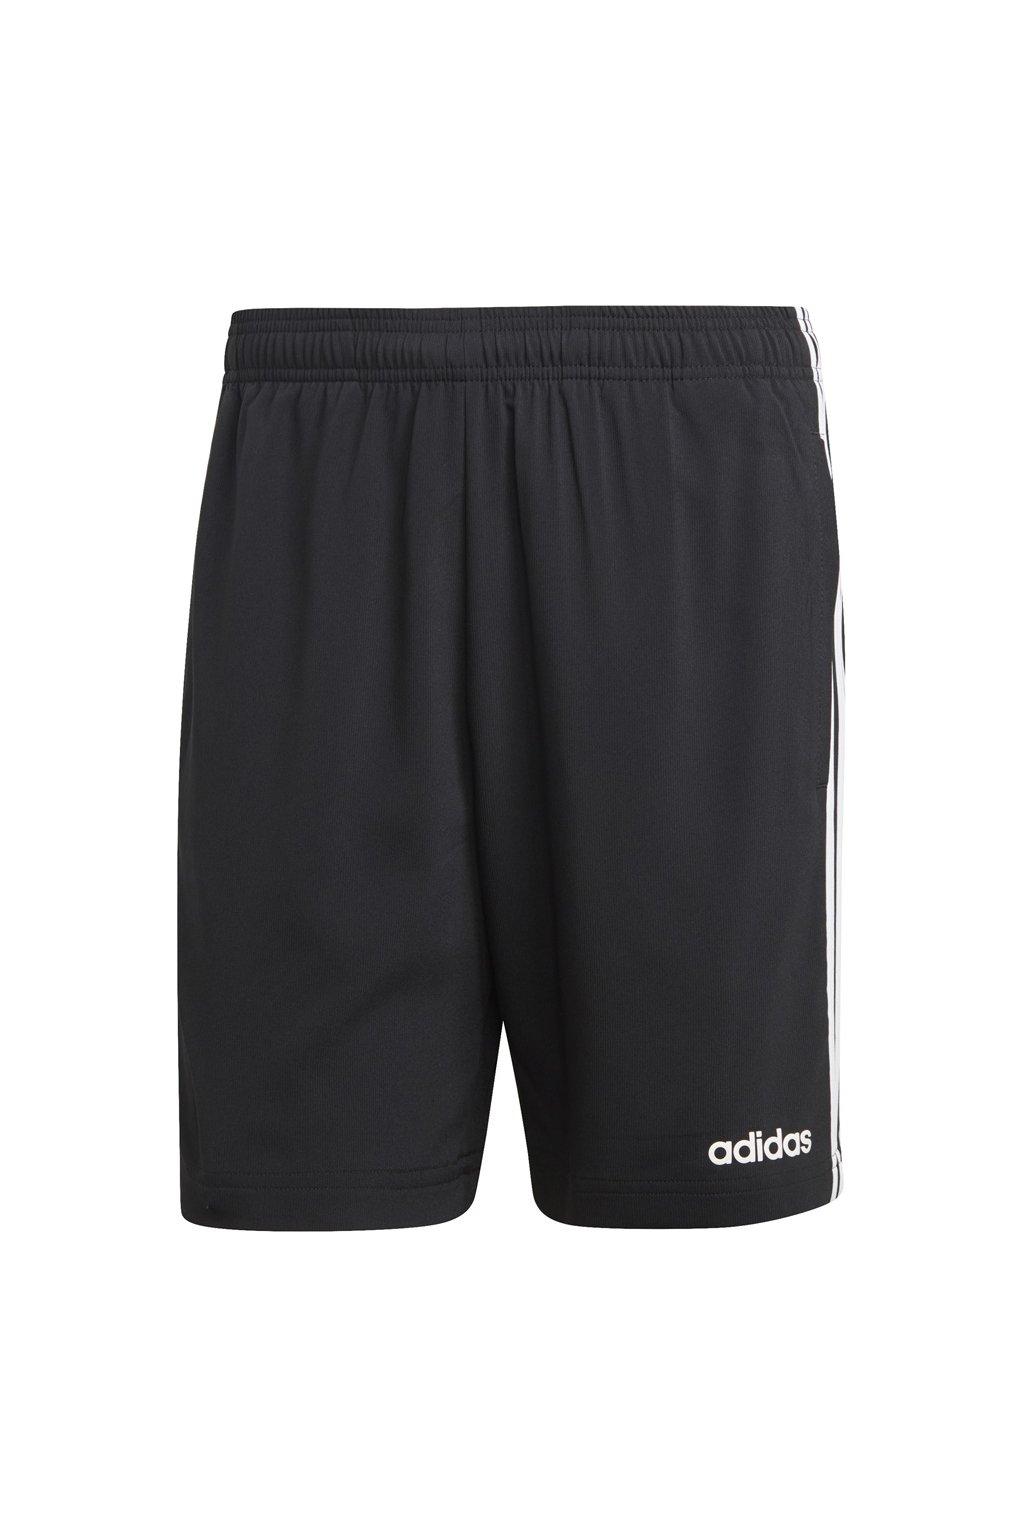 Pánske šortky Adidas Essentials 3S Chelsea Black DQ3073